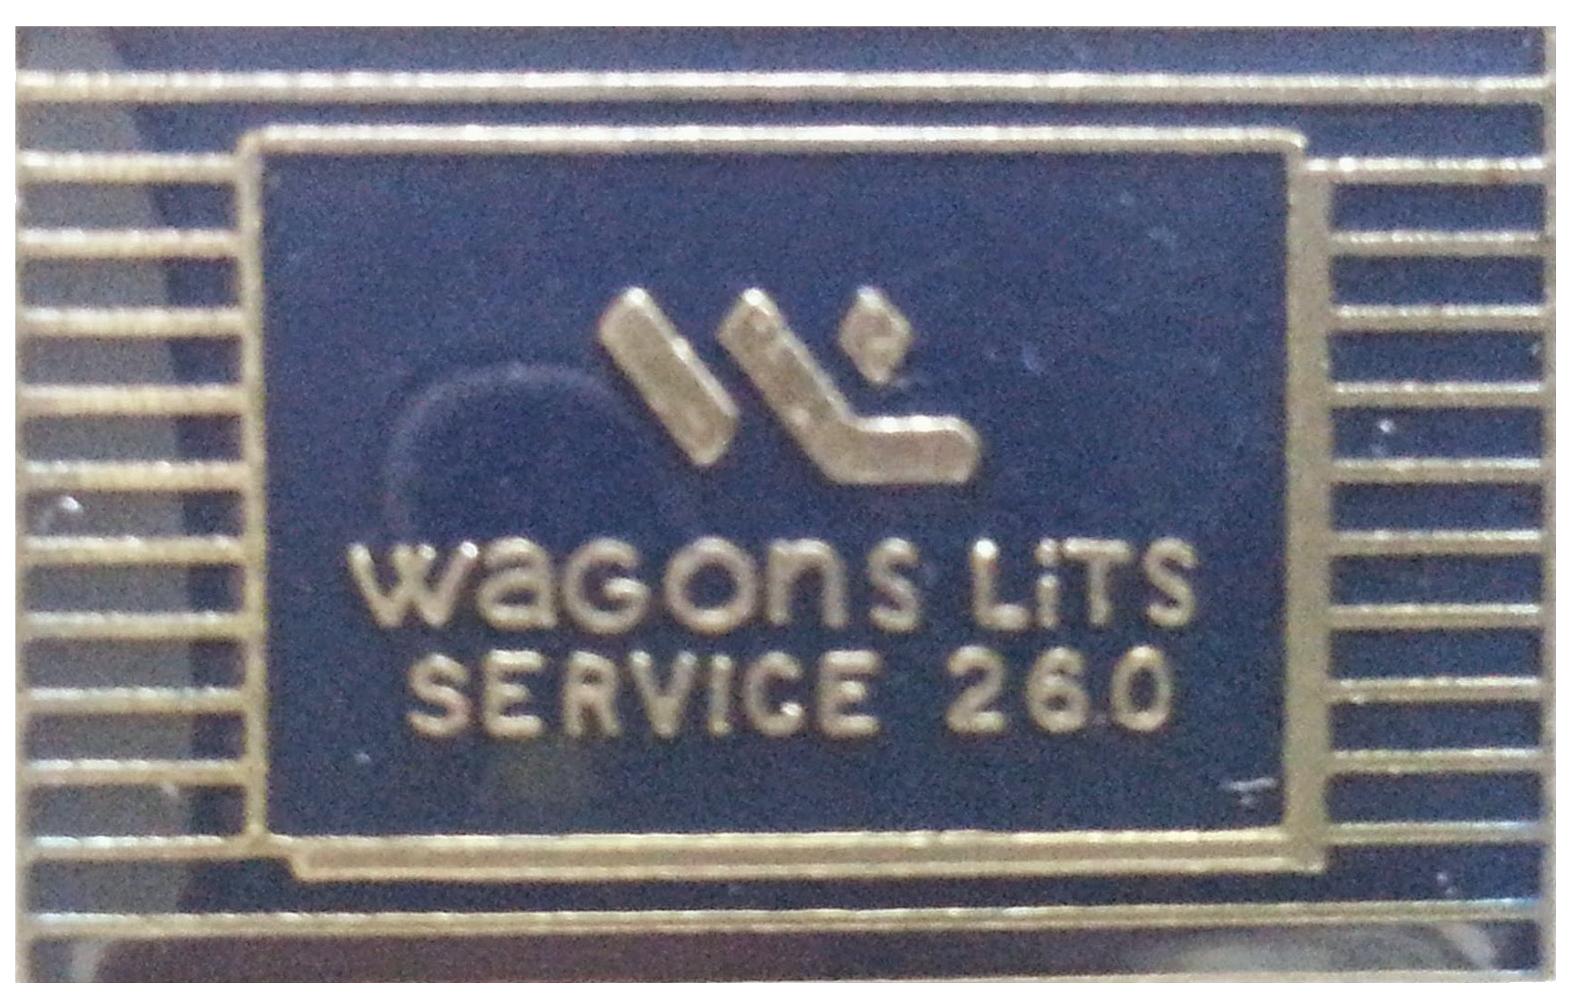 Wagons-Lits Service 260